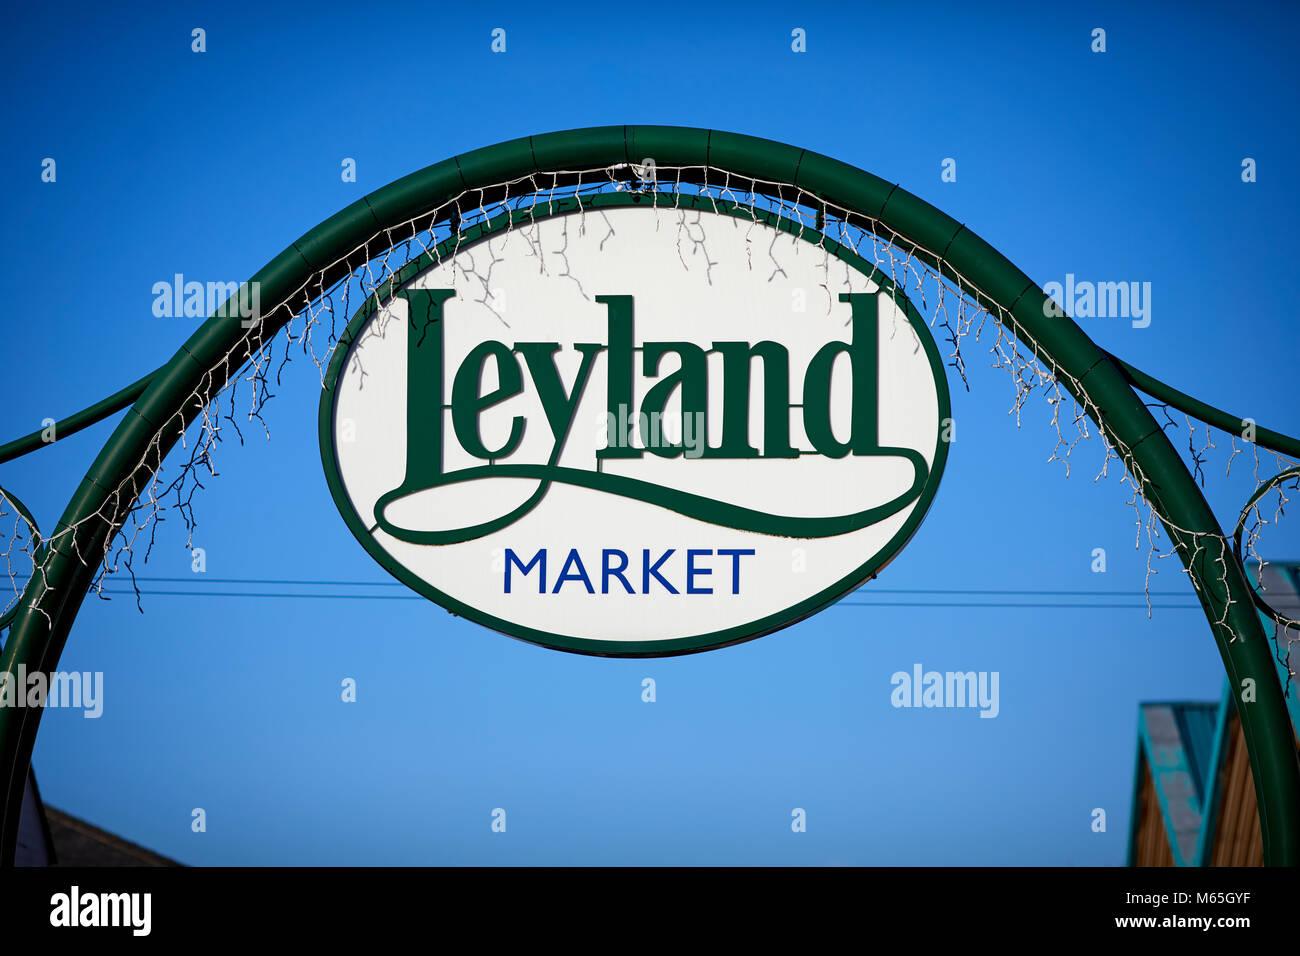 Leyland Market sign in the Lancashire village - Stock Image